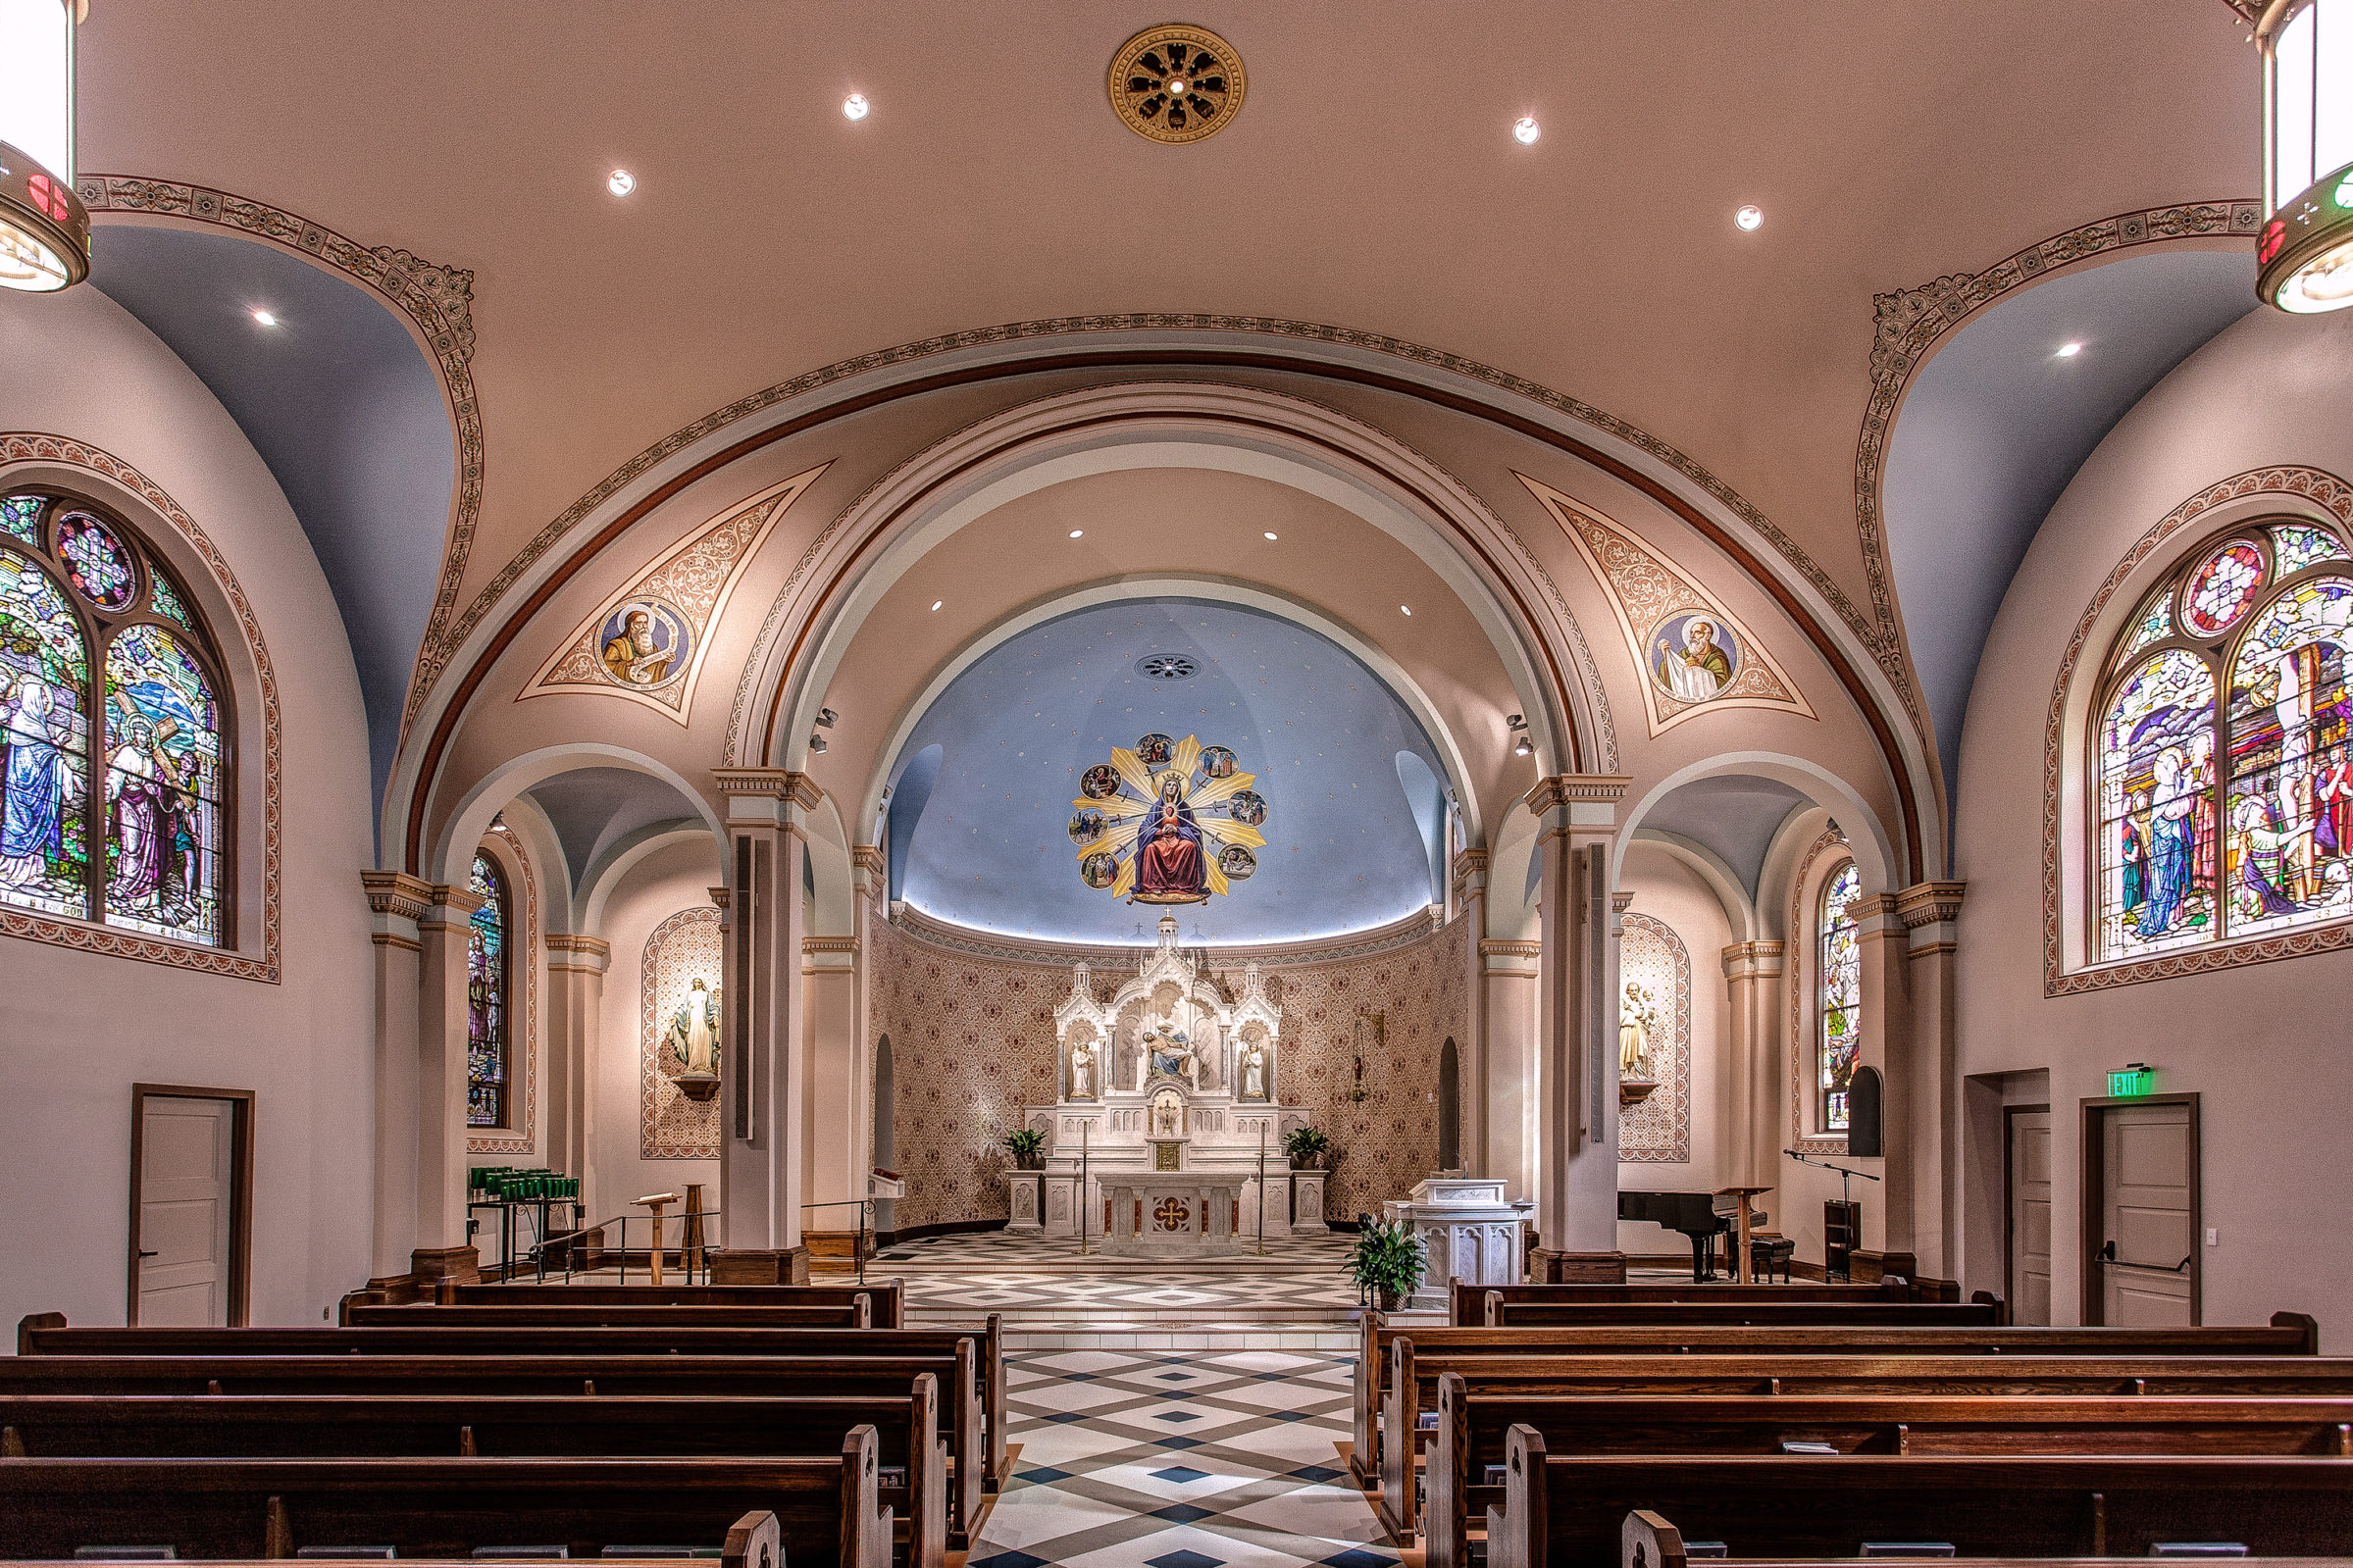 Seven Dolors Catholic Church